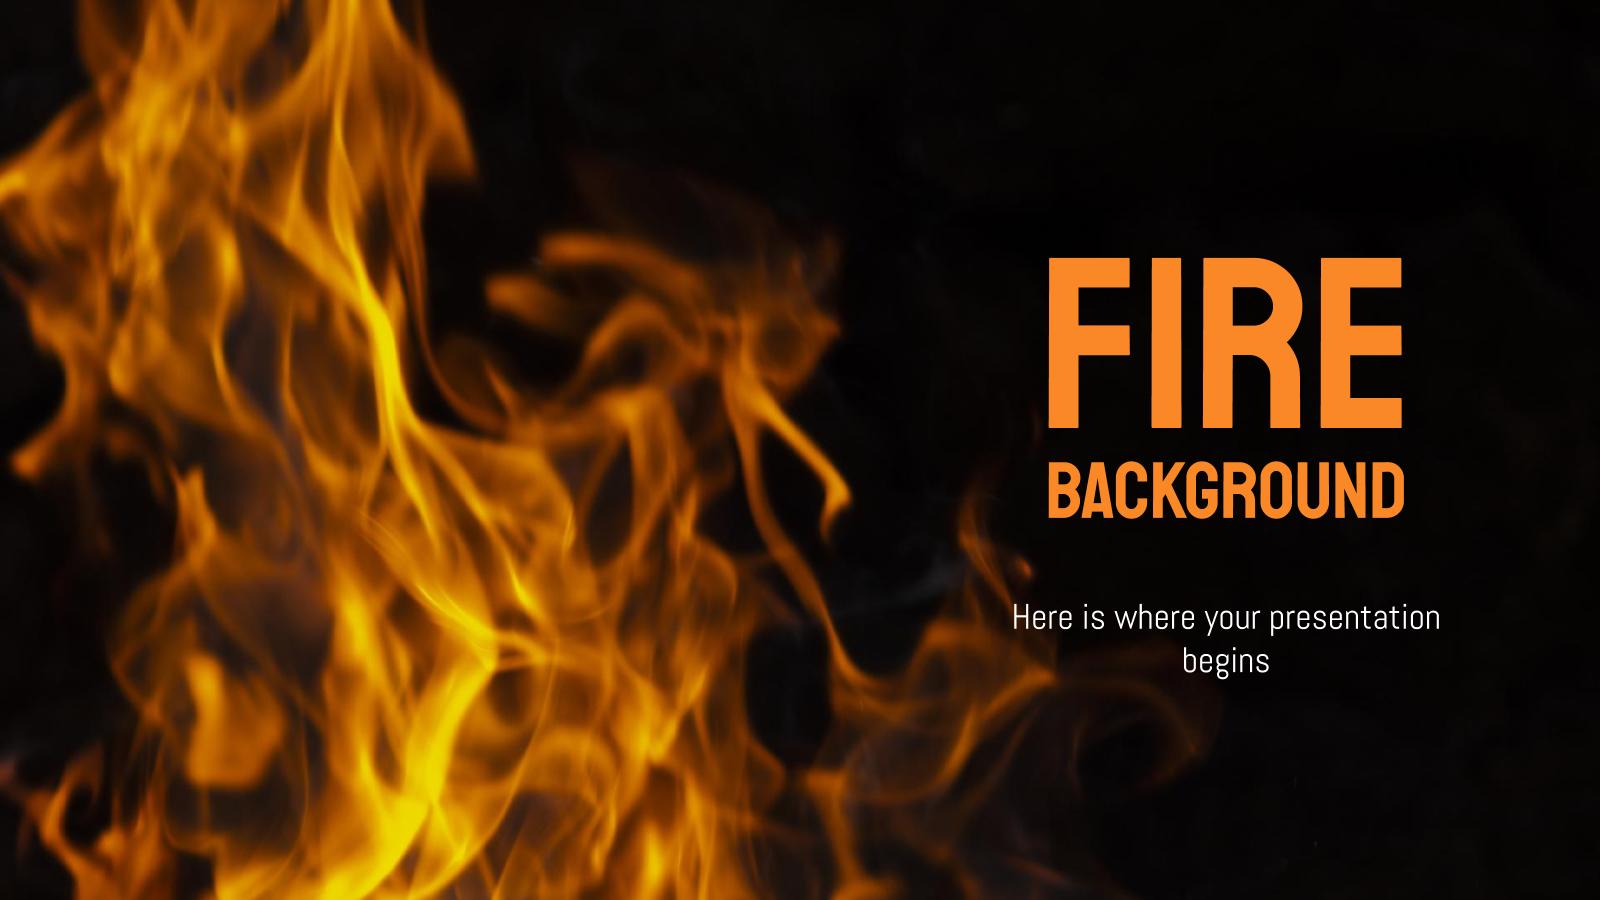 Fire Background presentation template